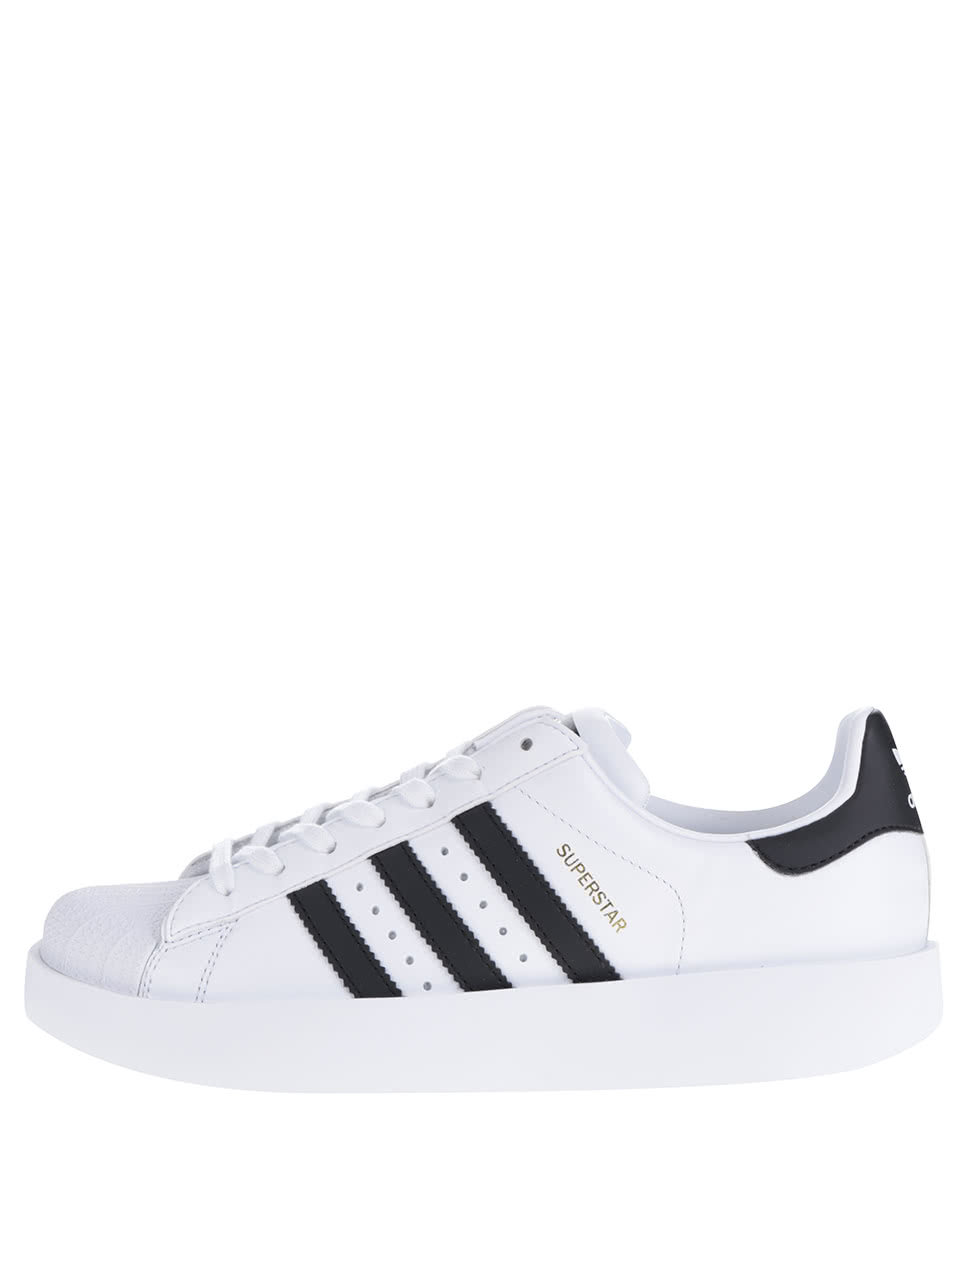 Biele dámske kožené tenisky na platforme adidas Originals Superstar ... 8c41a6d9d34